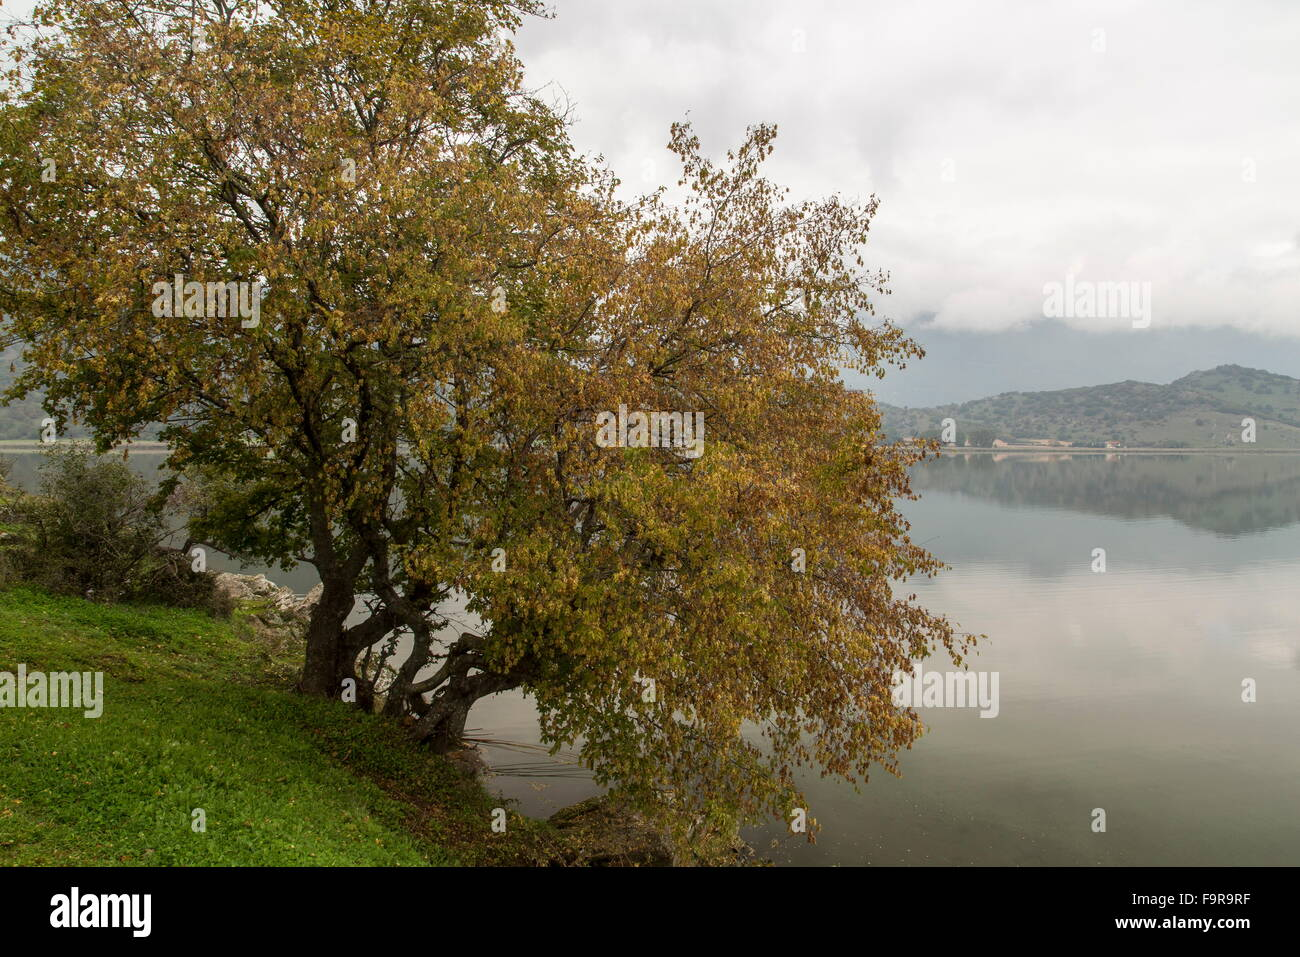 Oriental Hornbeam, Carpinus orientalis with autumn colour, at Lake Zazari, Florina, Macedonian Greece. - Stock Image